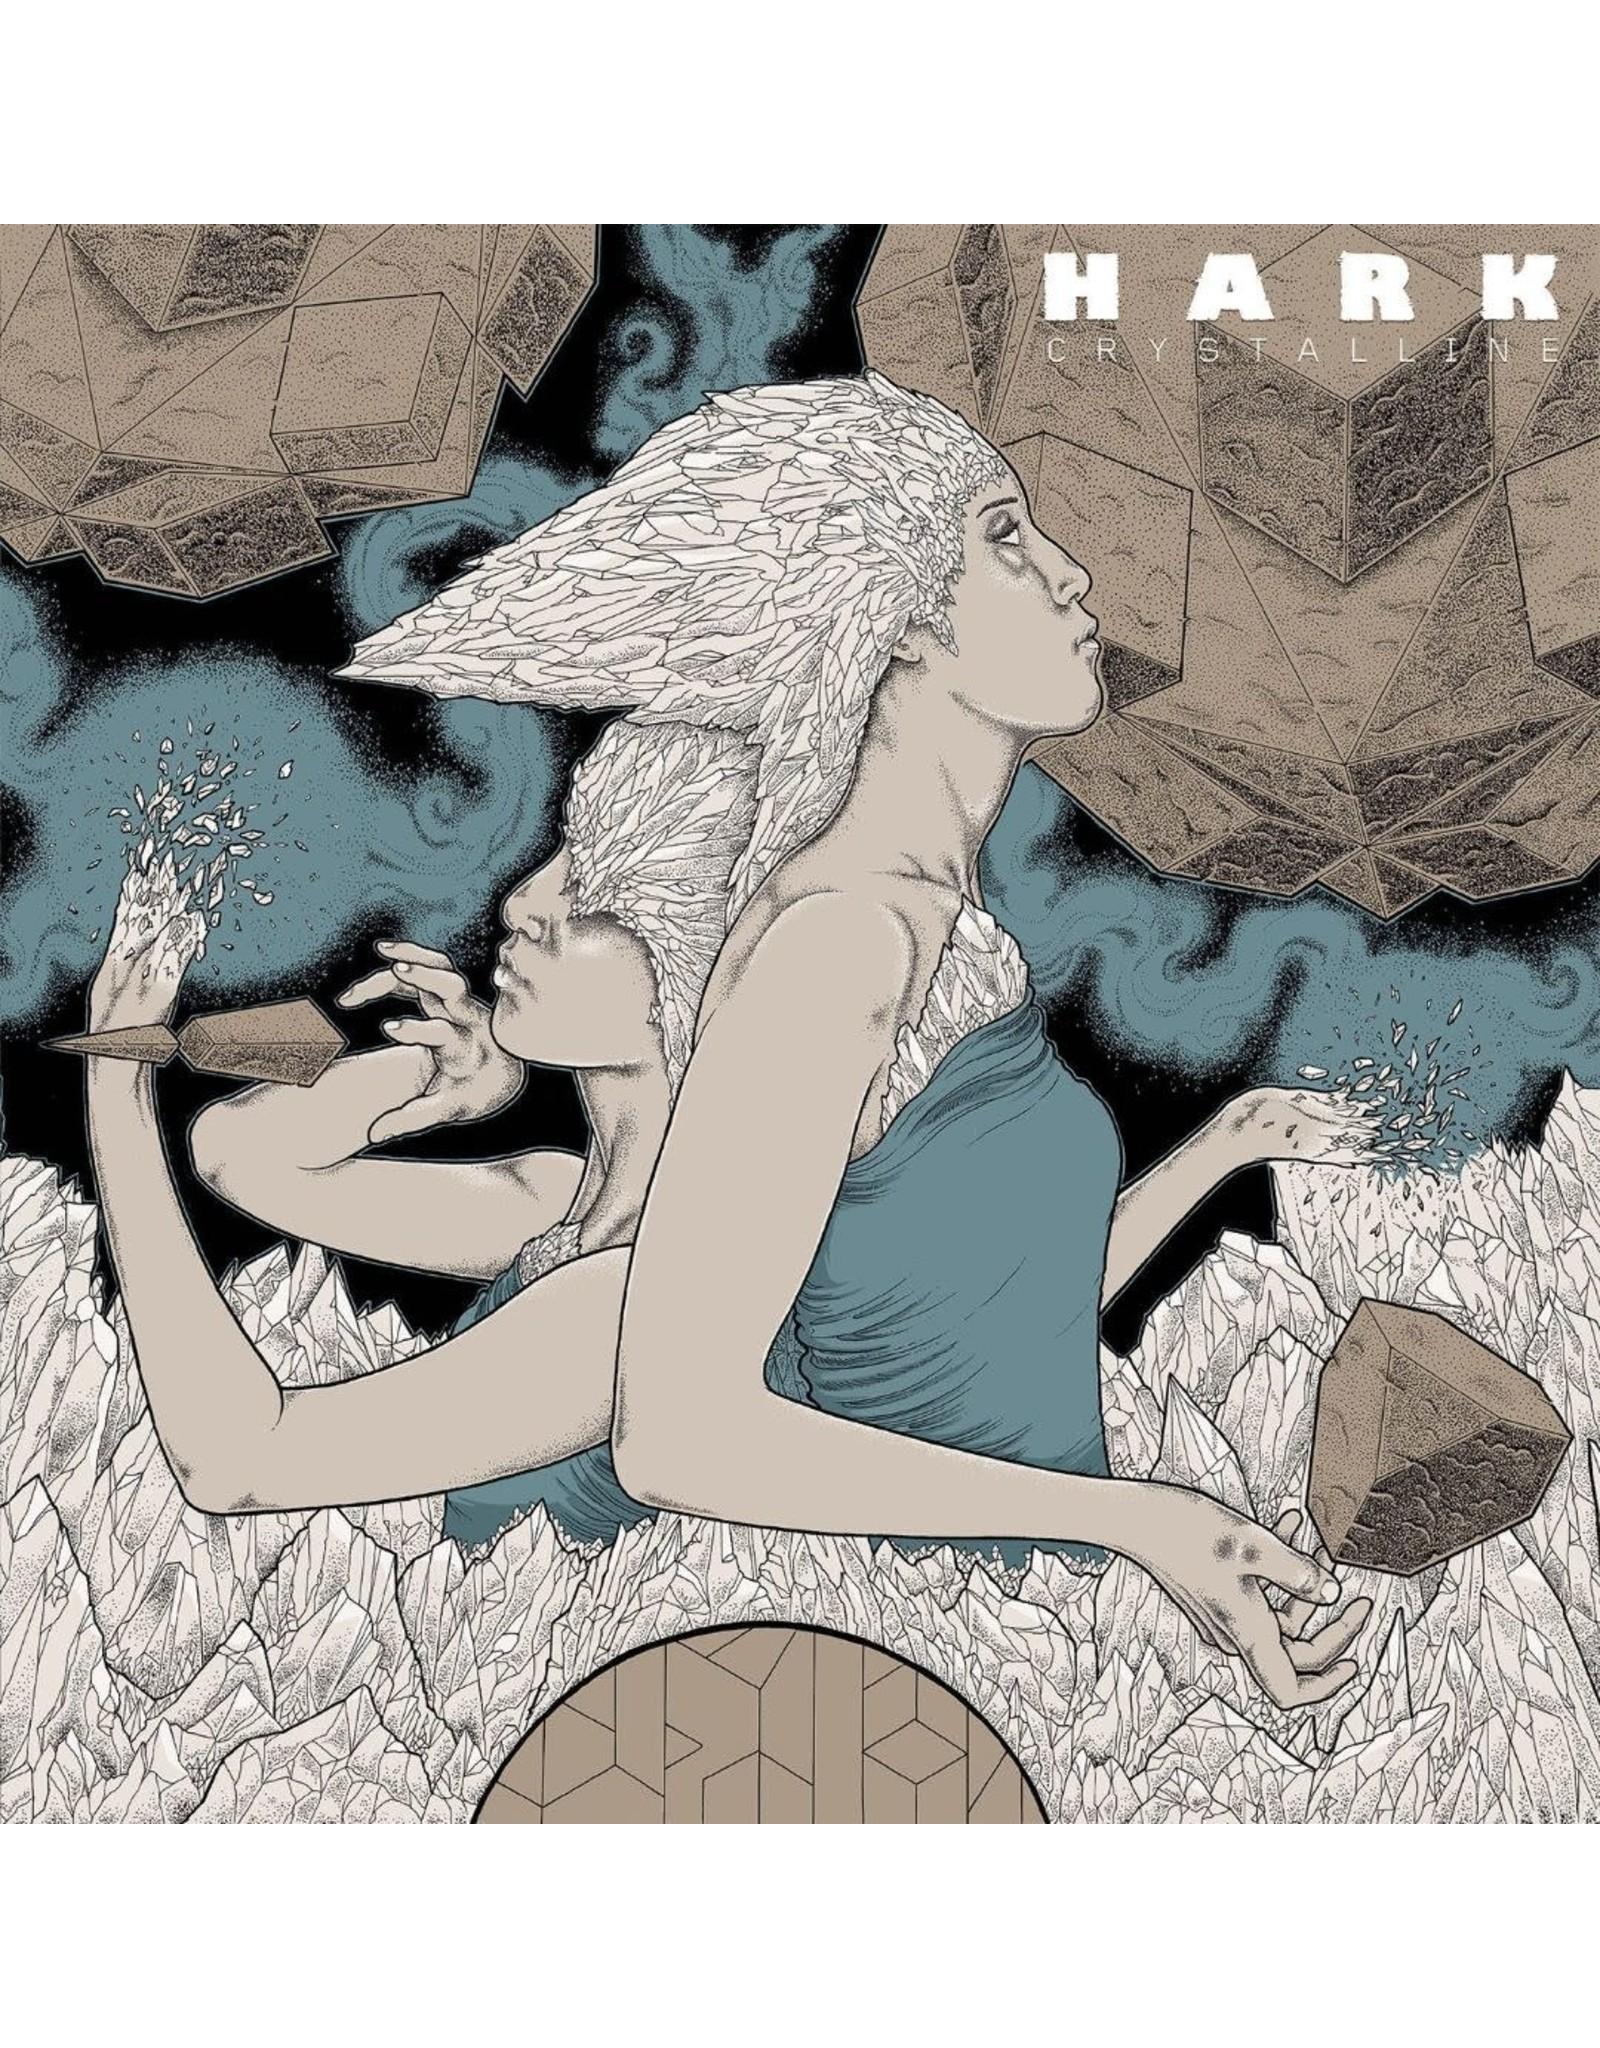 Hark - Crystalline CD